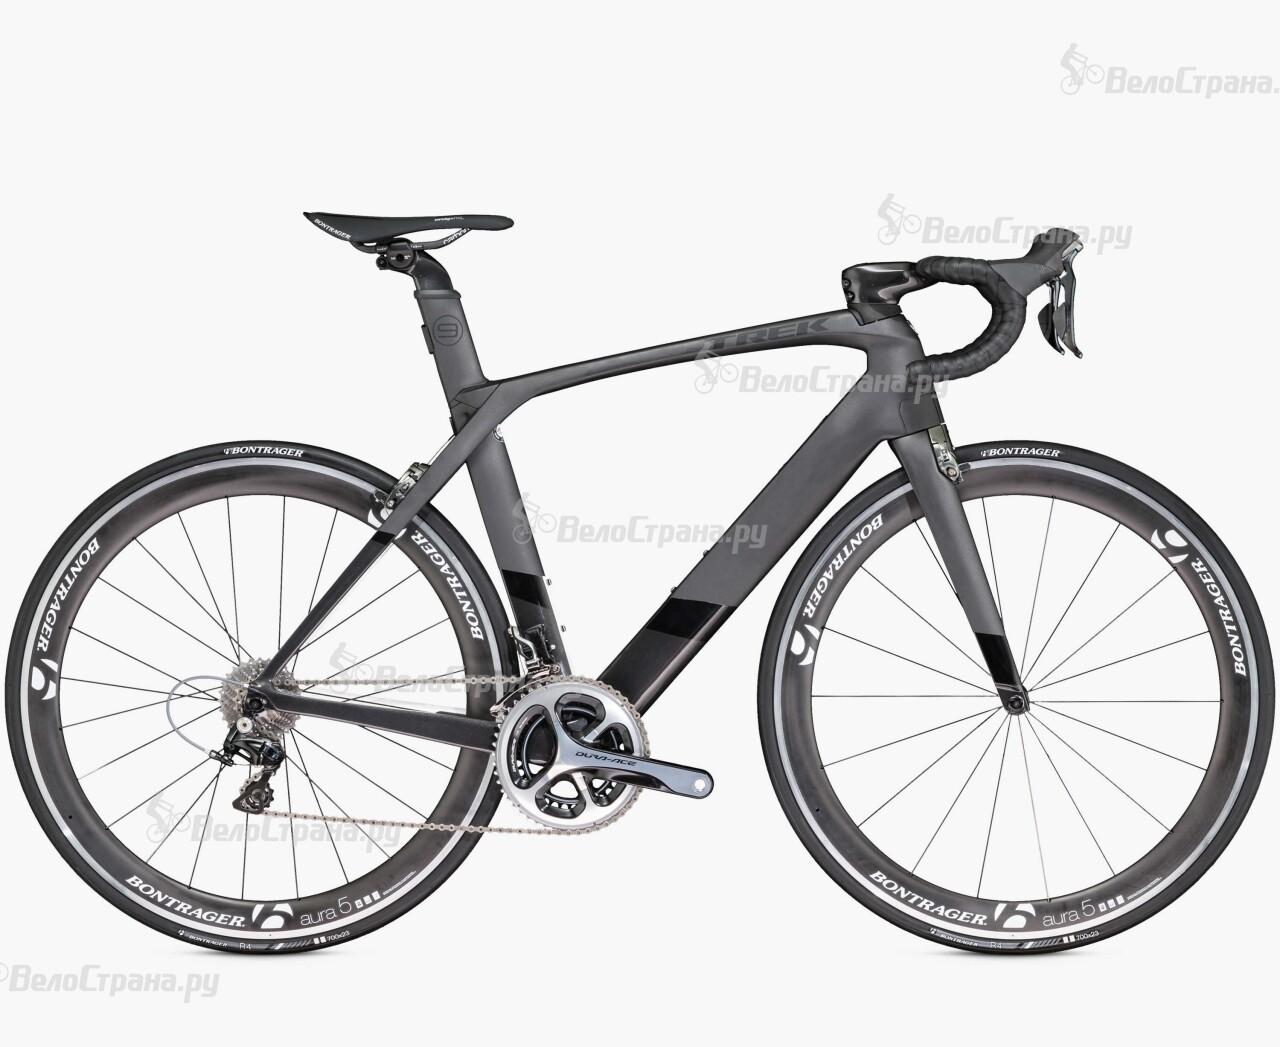 Велосипед Trek Madone 9.5 (2016) велосипед trek madone 4 5 2013